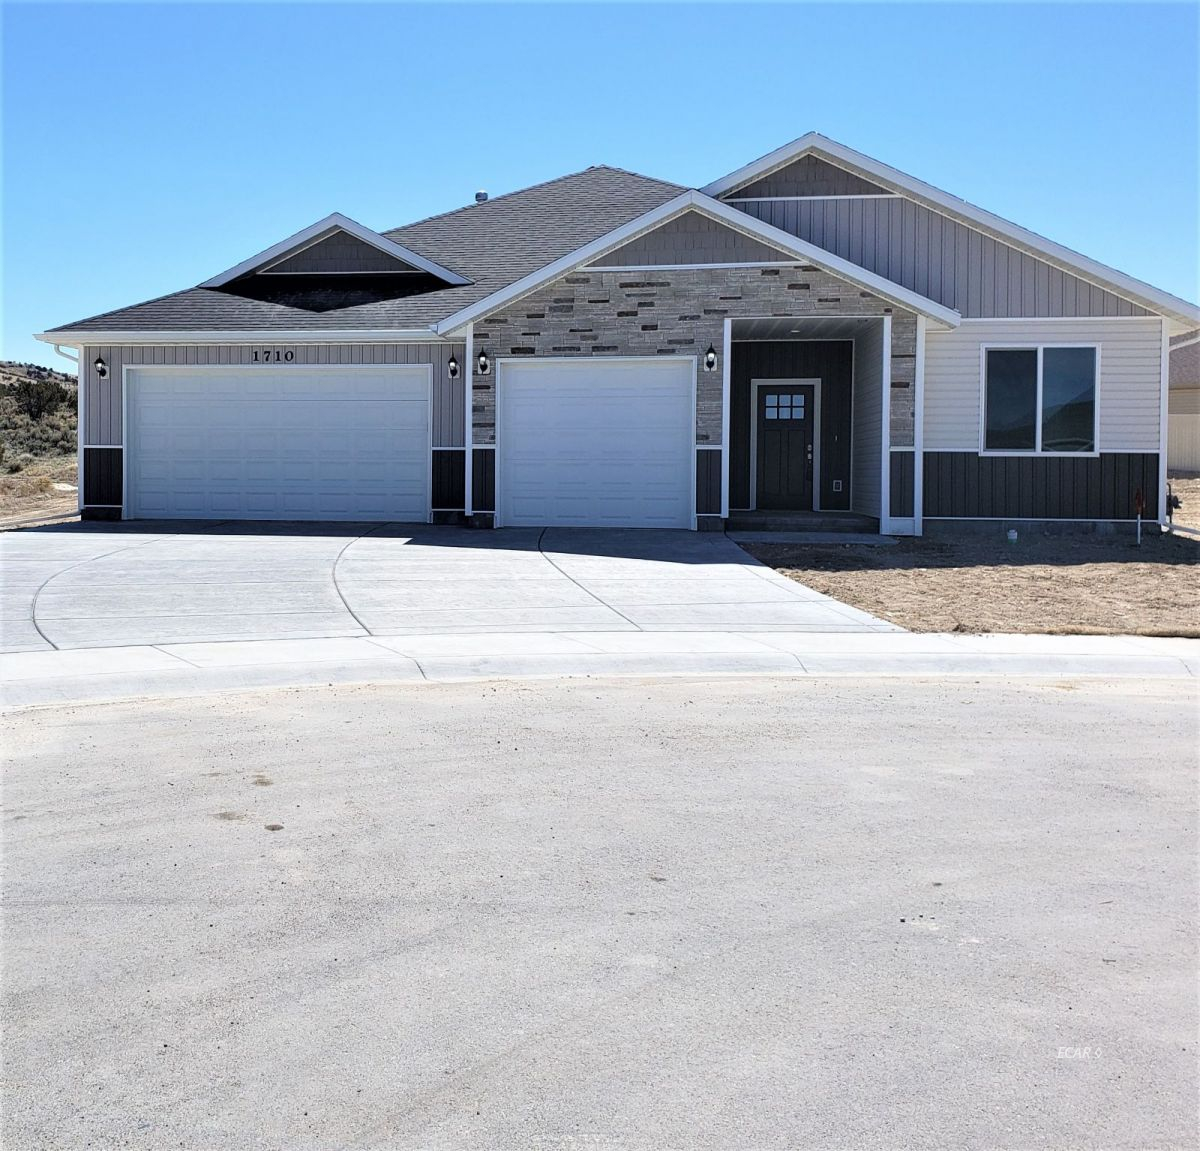 Lot 315 Deerfield Way Property Photo - Elko, NV real estate listing